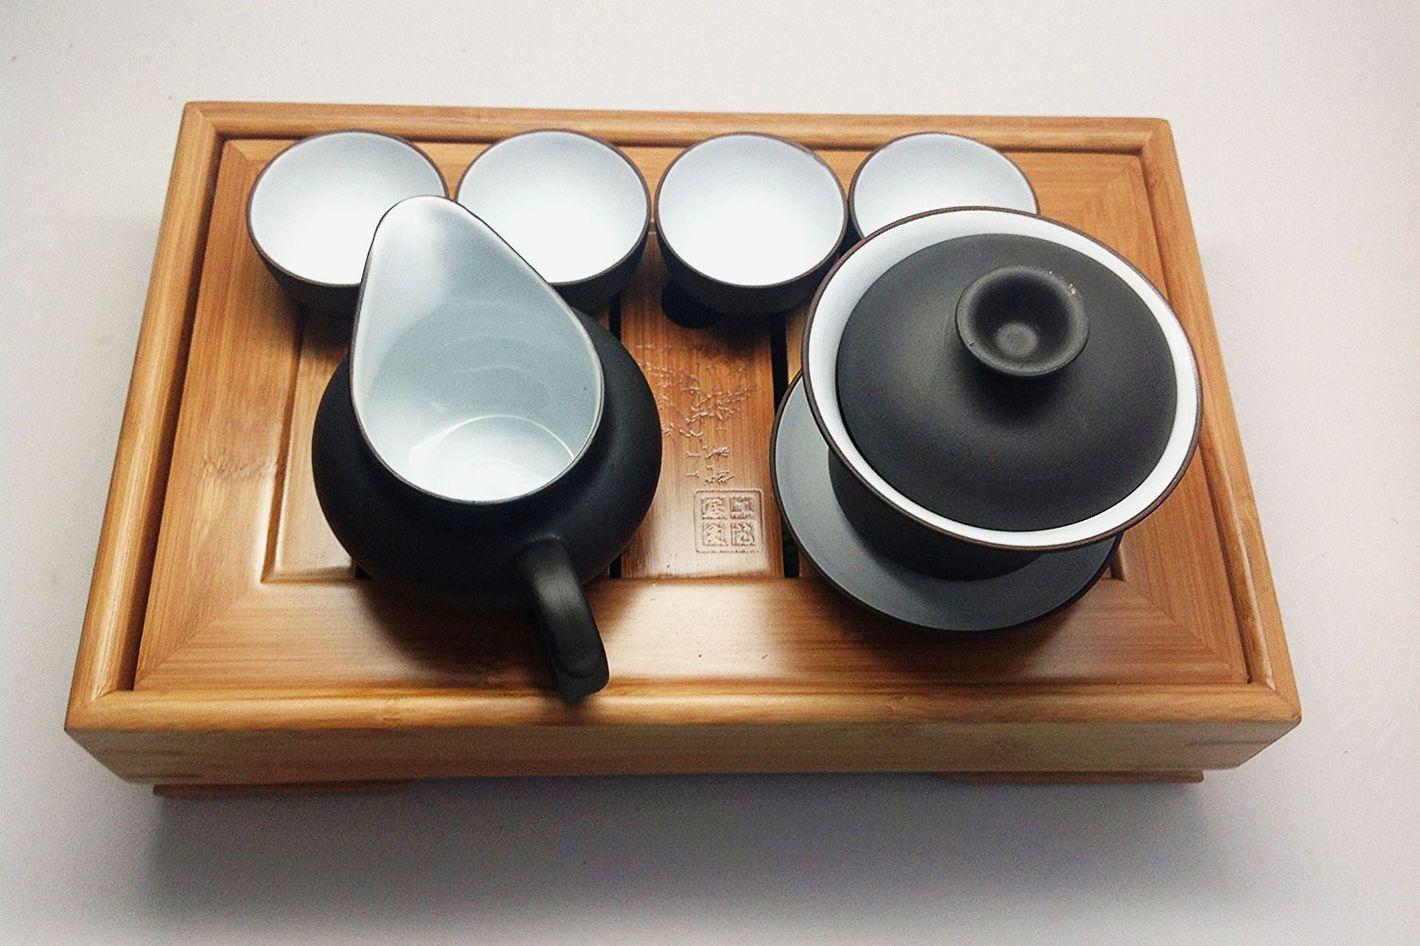 Music City Tea Gaiwan Tea Set With Bamboo Tea Tray